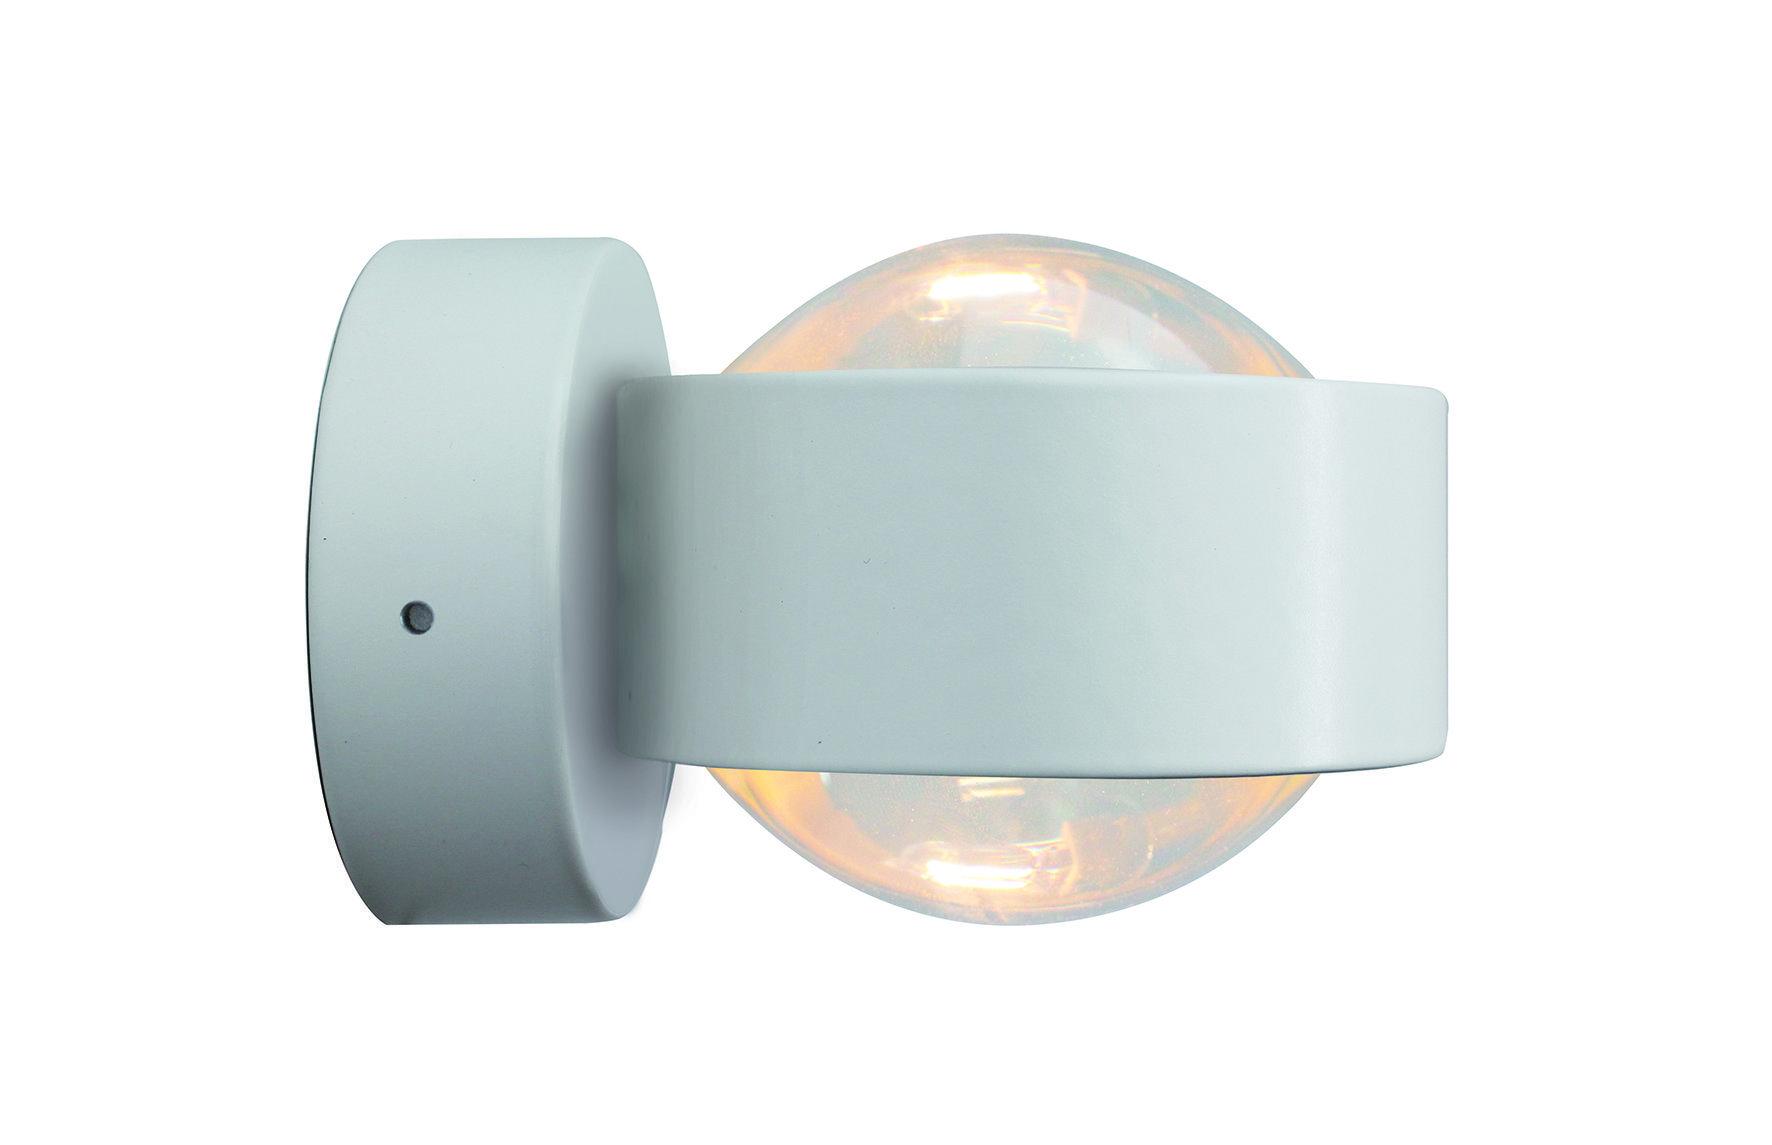 Top Light Wandleuchte Puk Wall LED LED Weiß